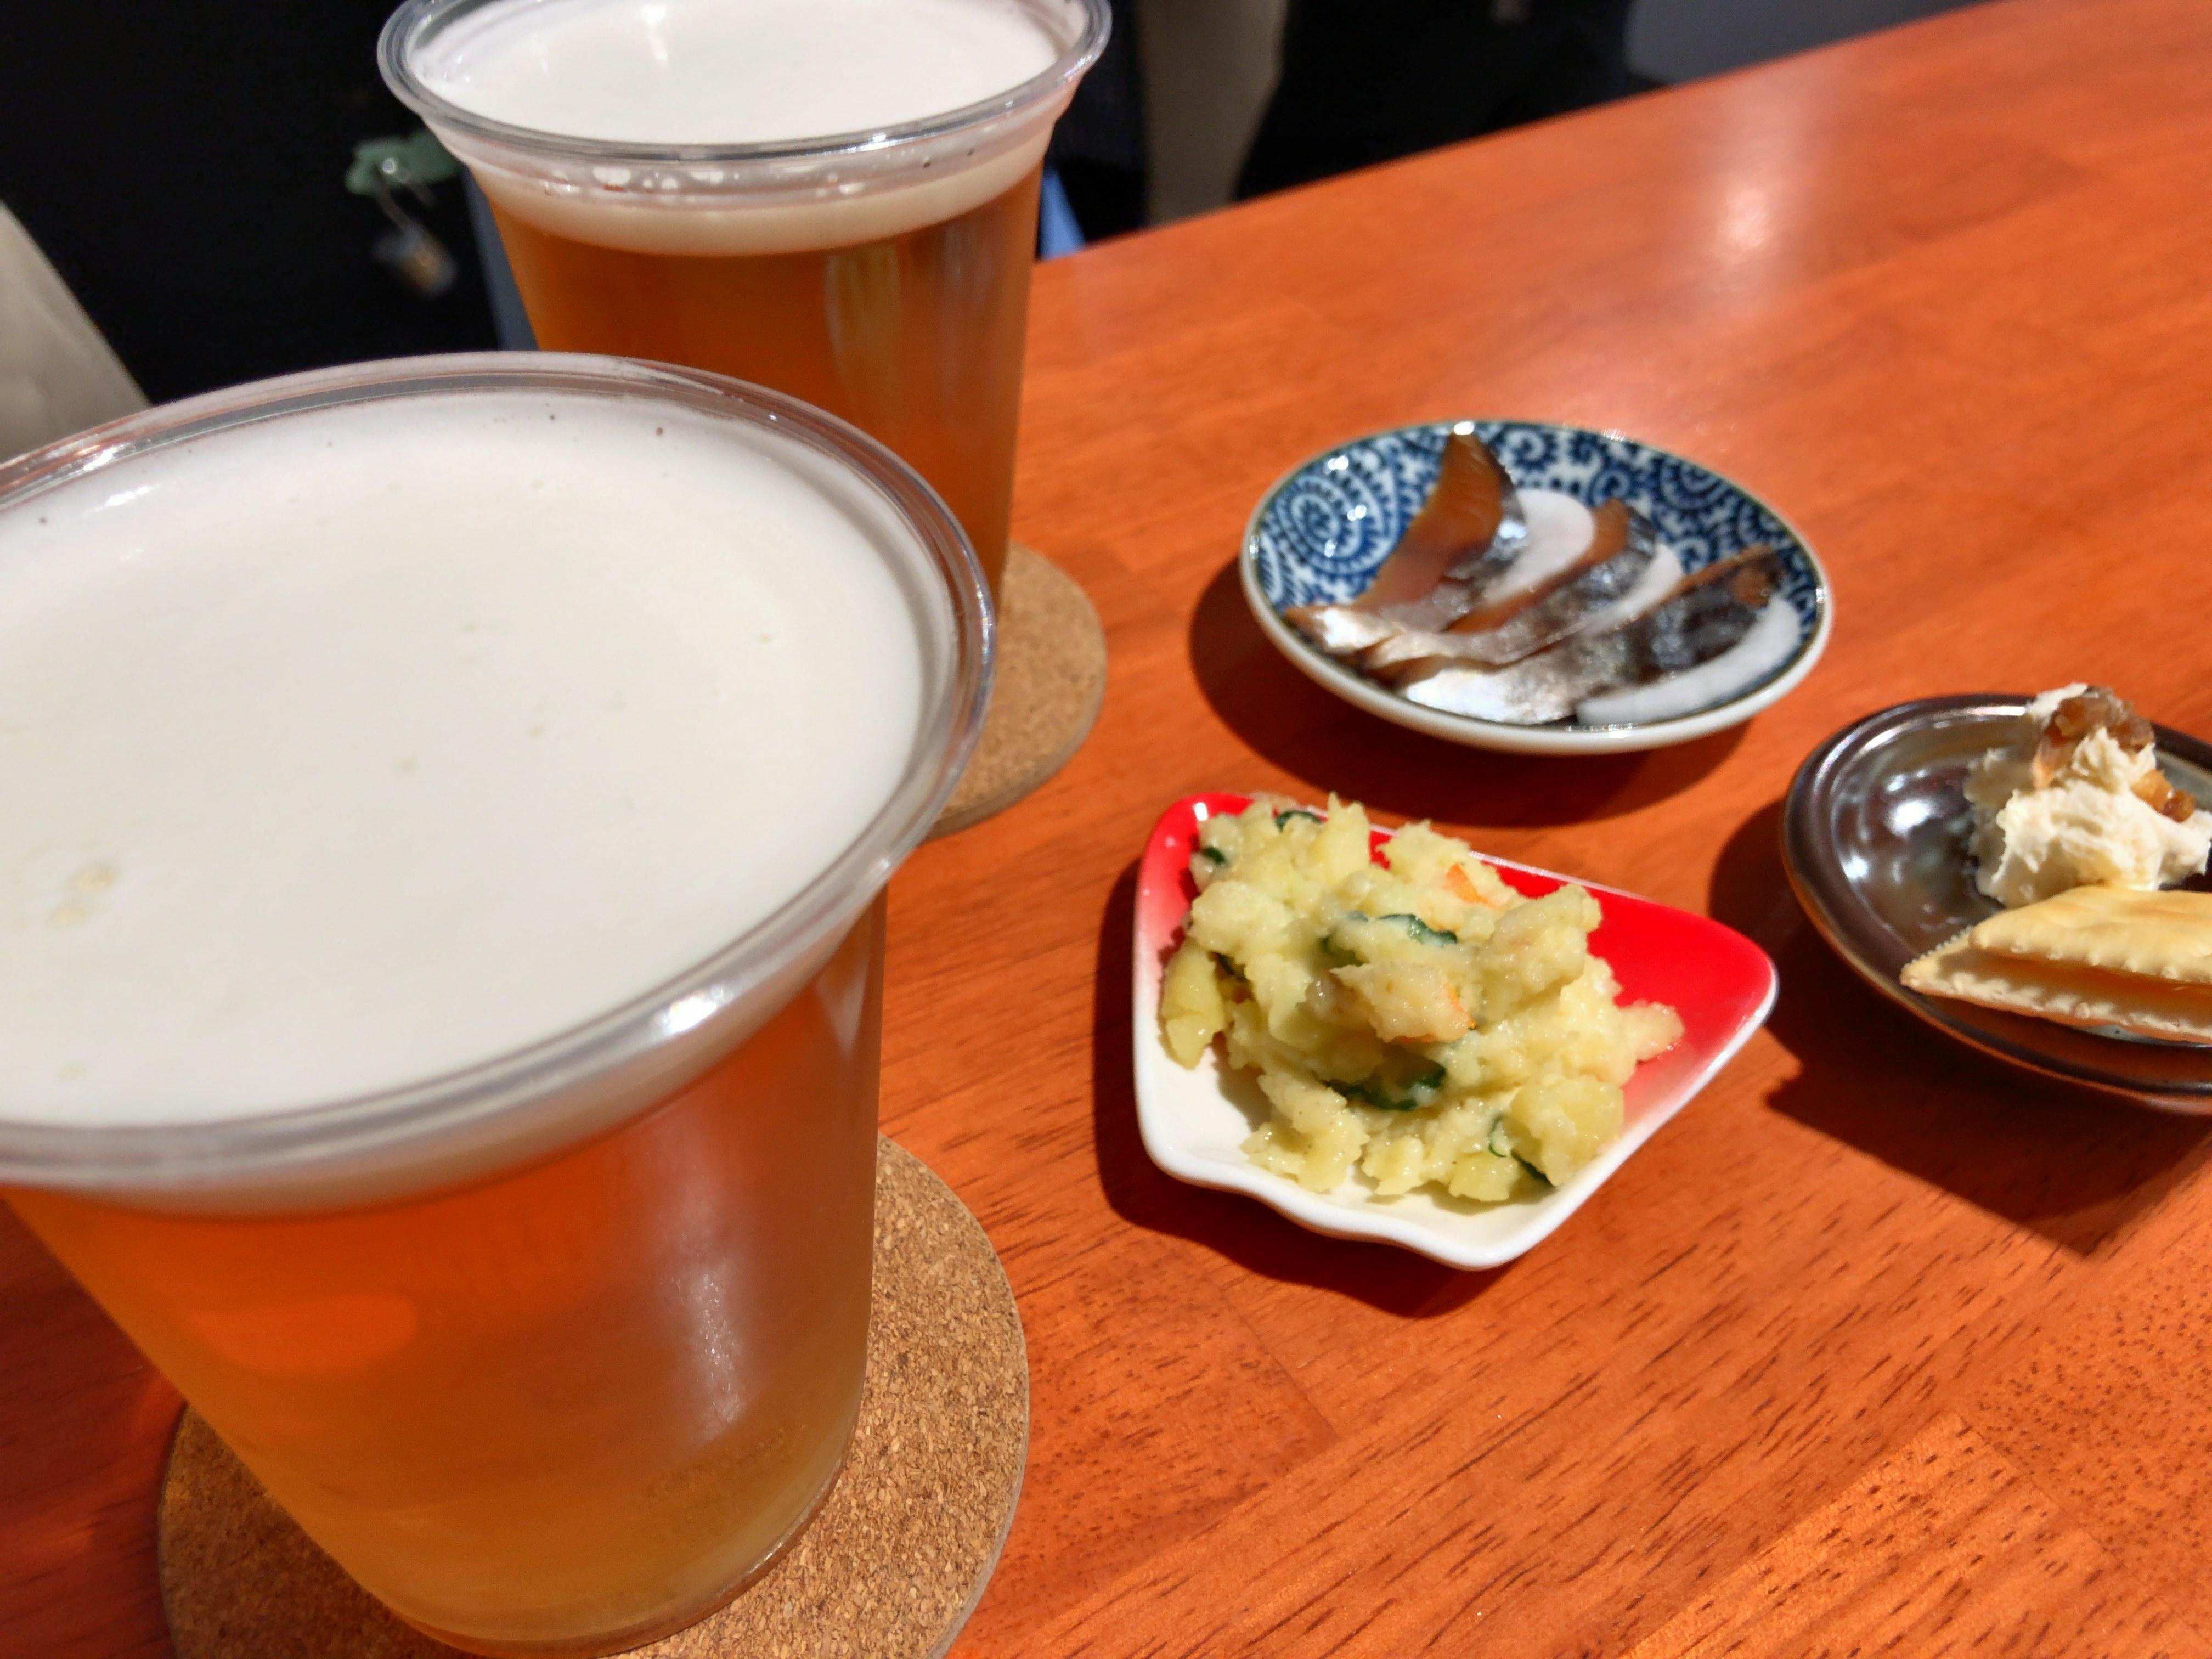 casava-beer-osuzai1